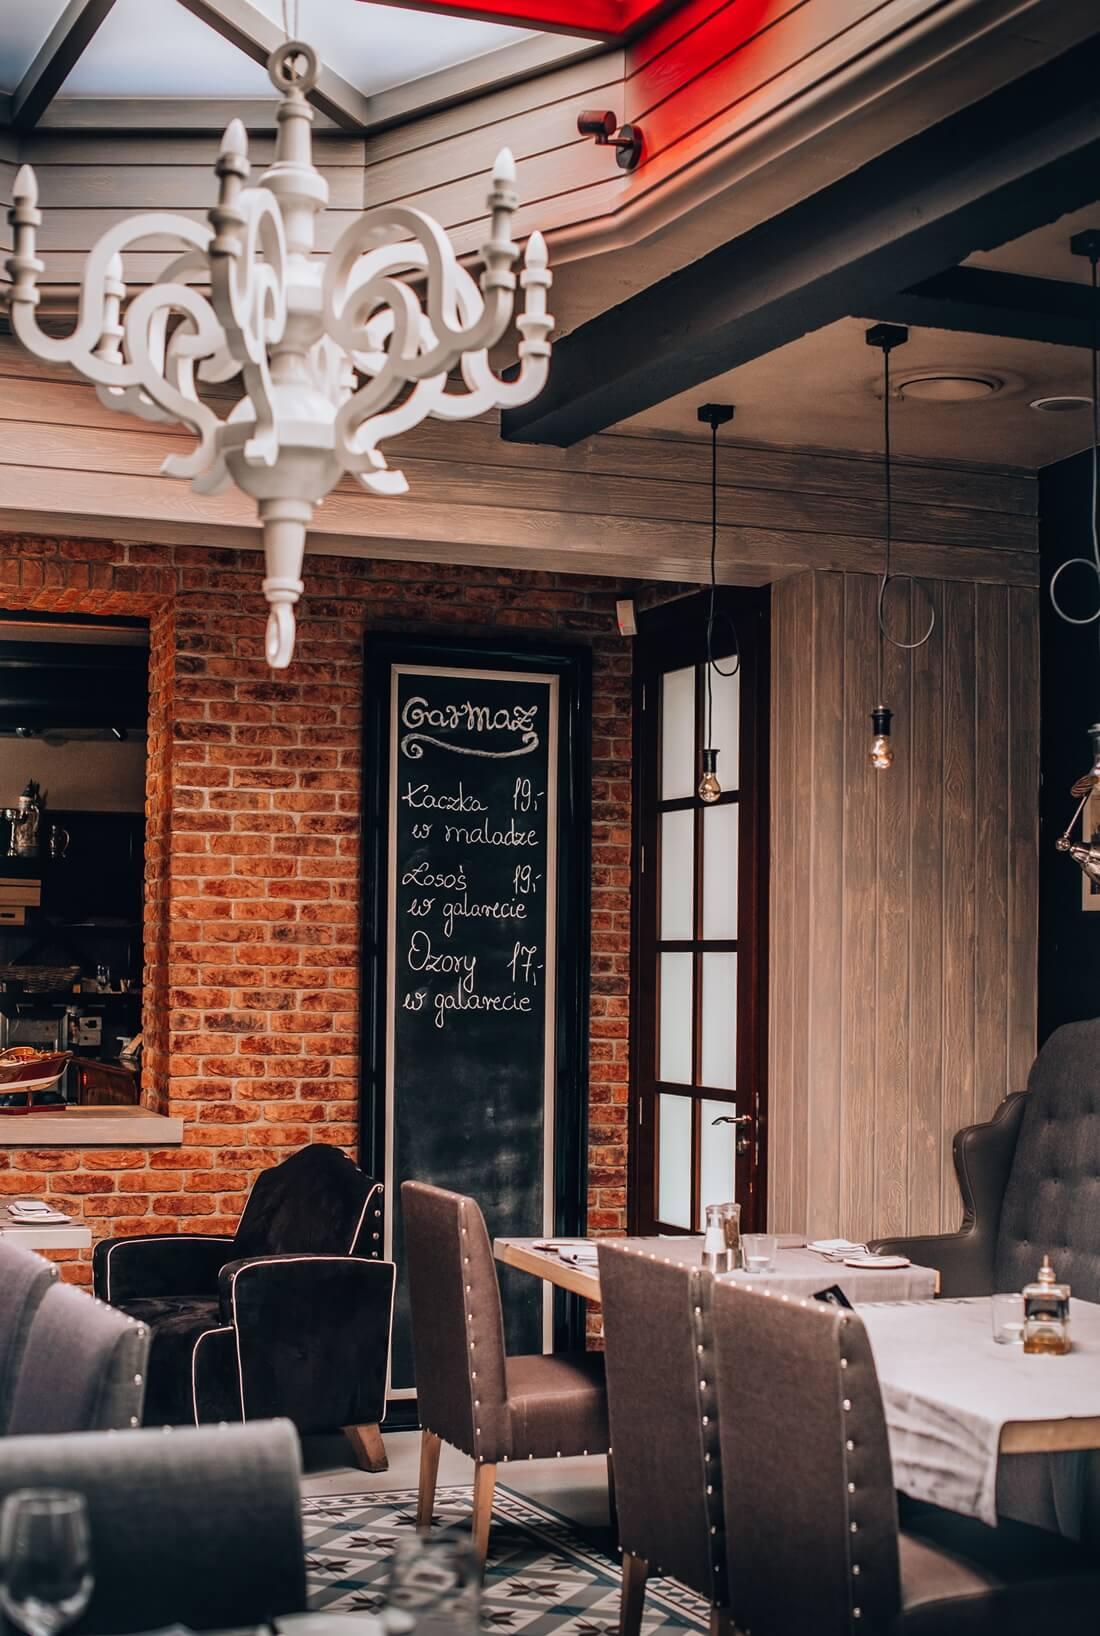 Kubicki 7 1 - A must see on the map of Gdańsk: Kubicki restaurant